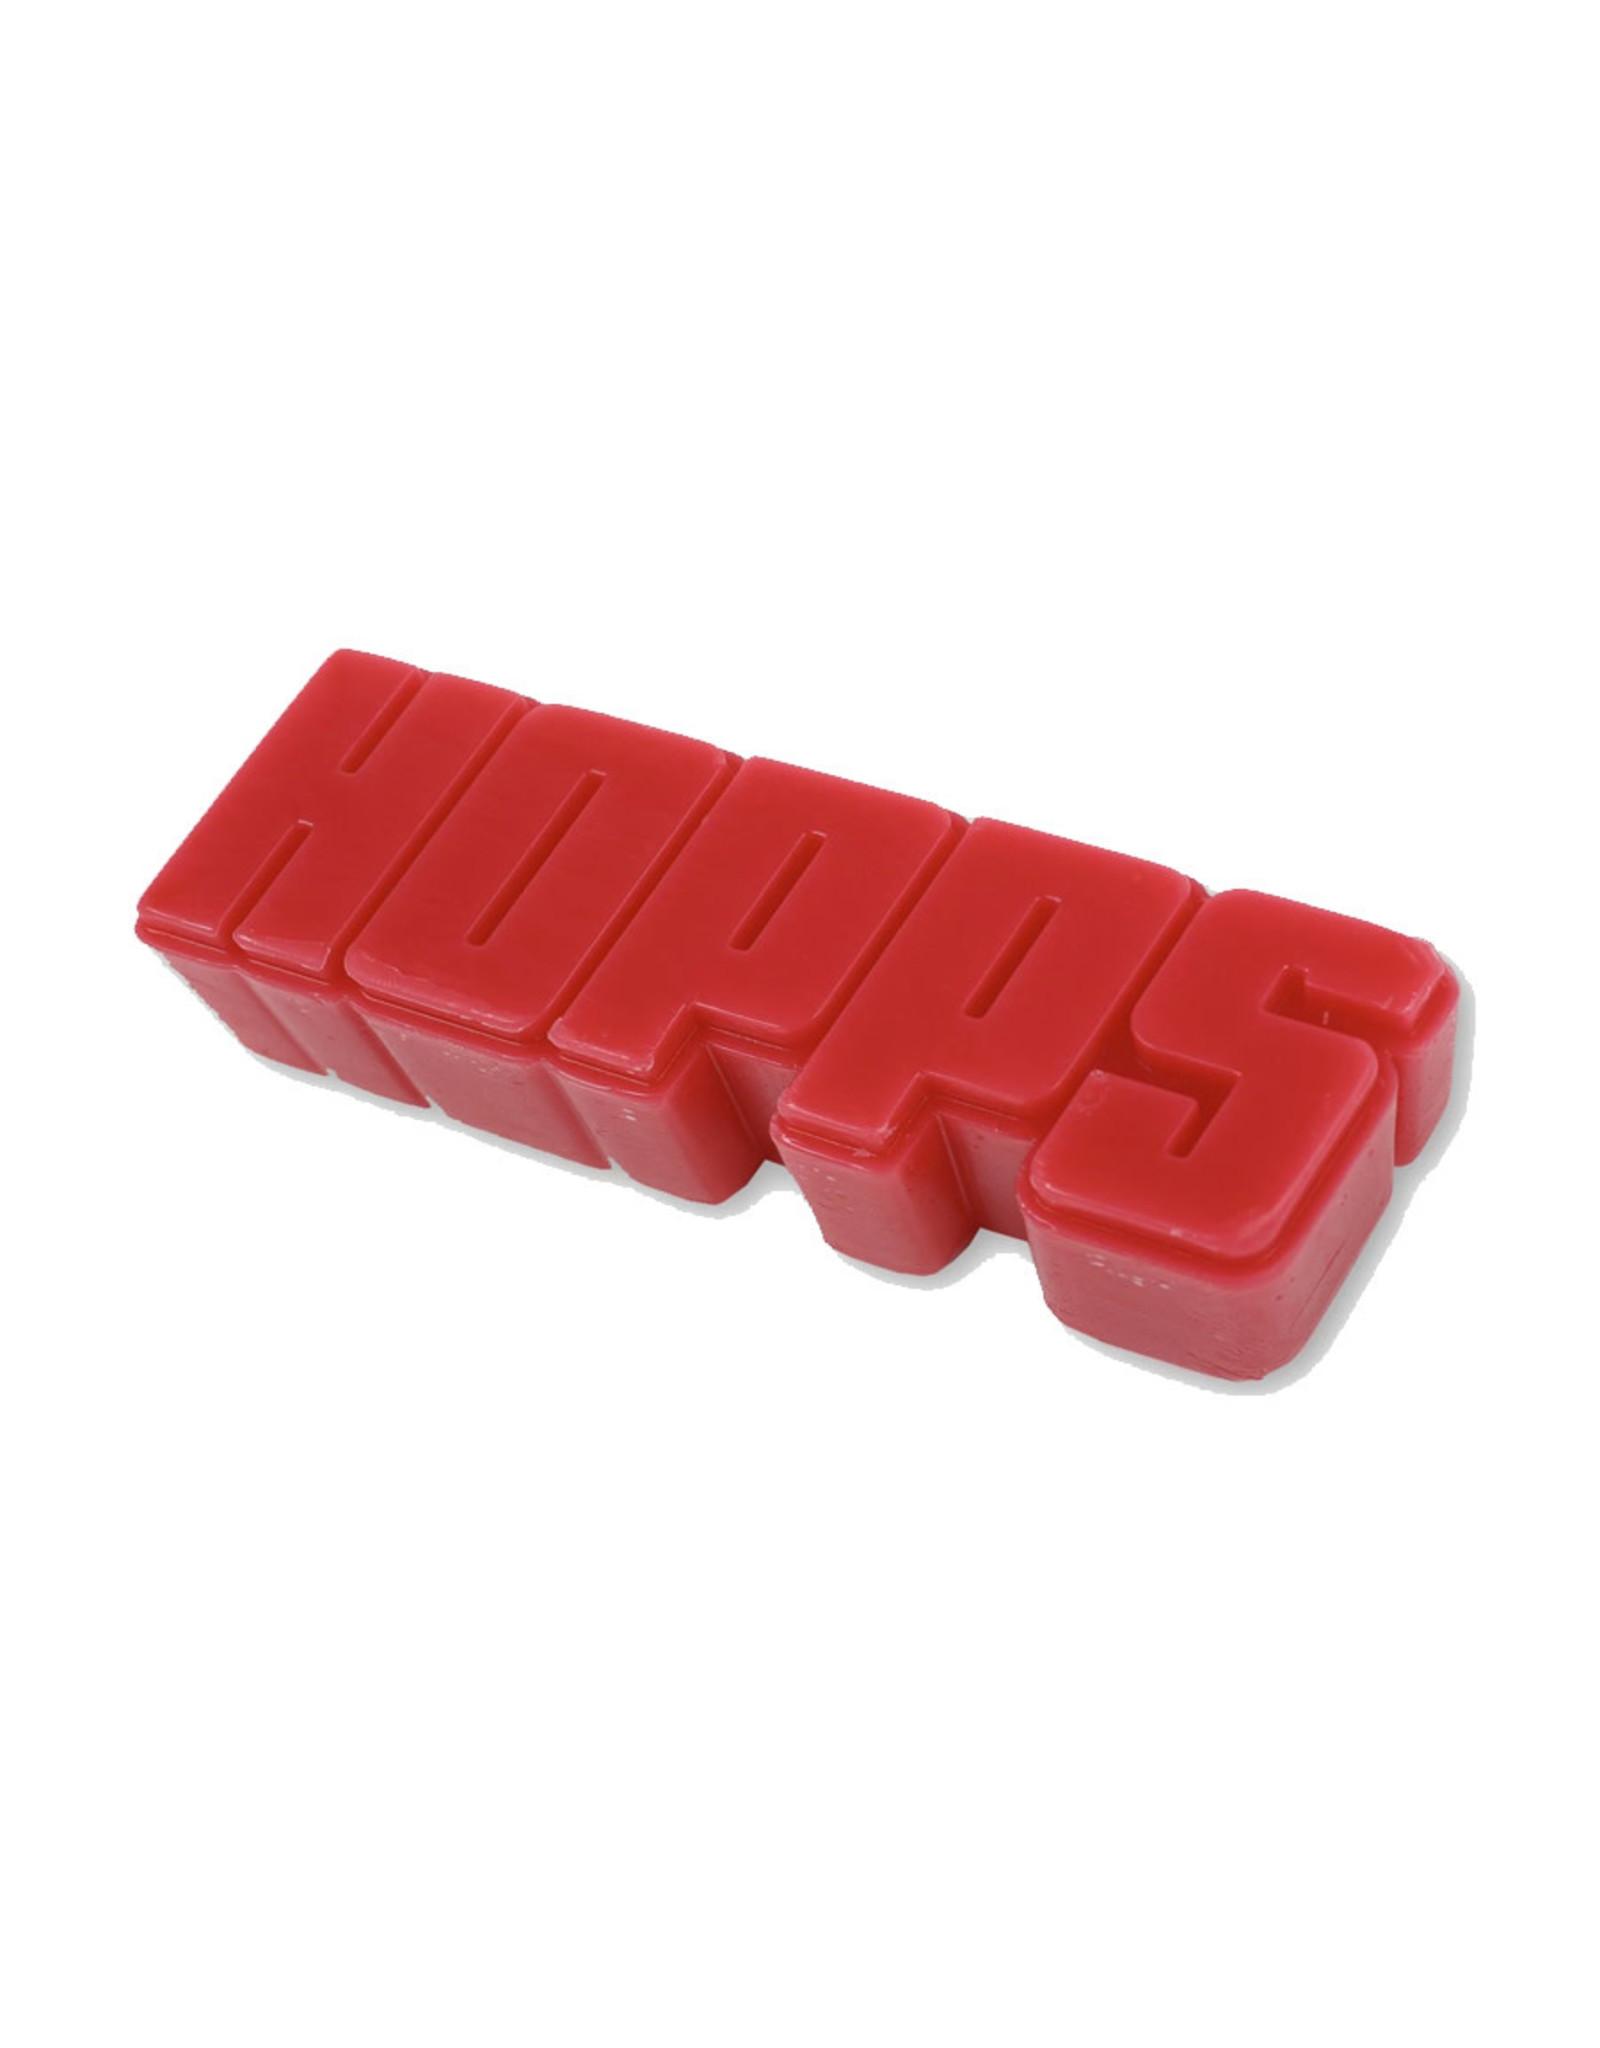 Hopps Hopps Wax Big Hopps Red